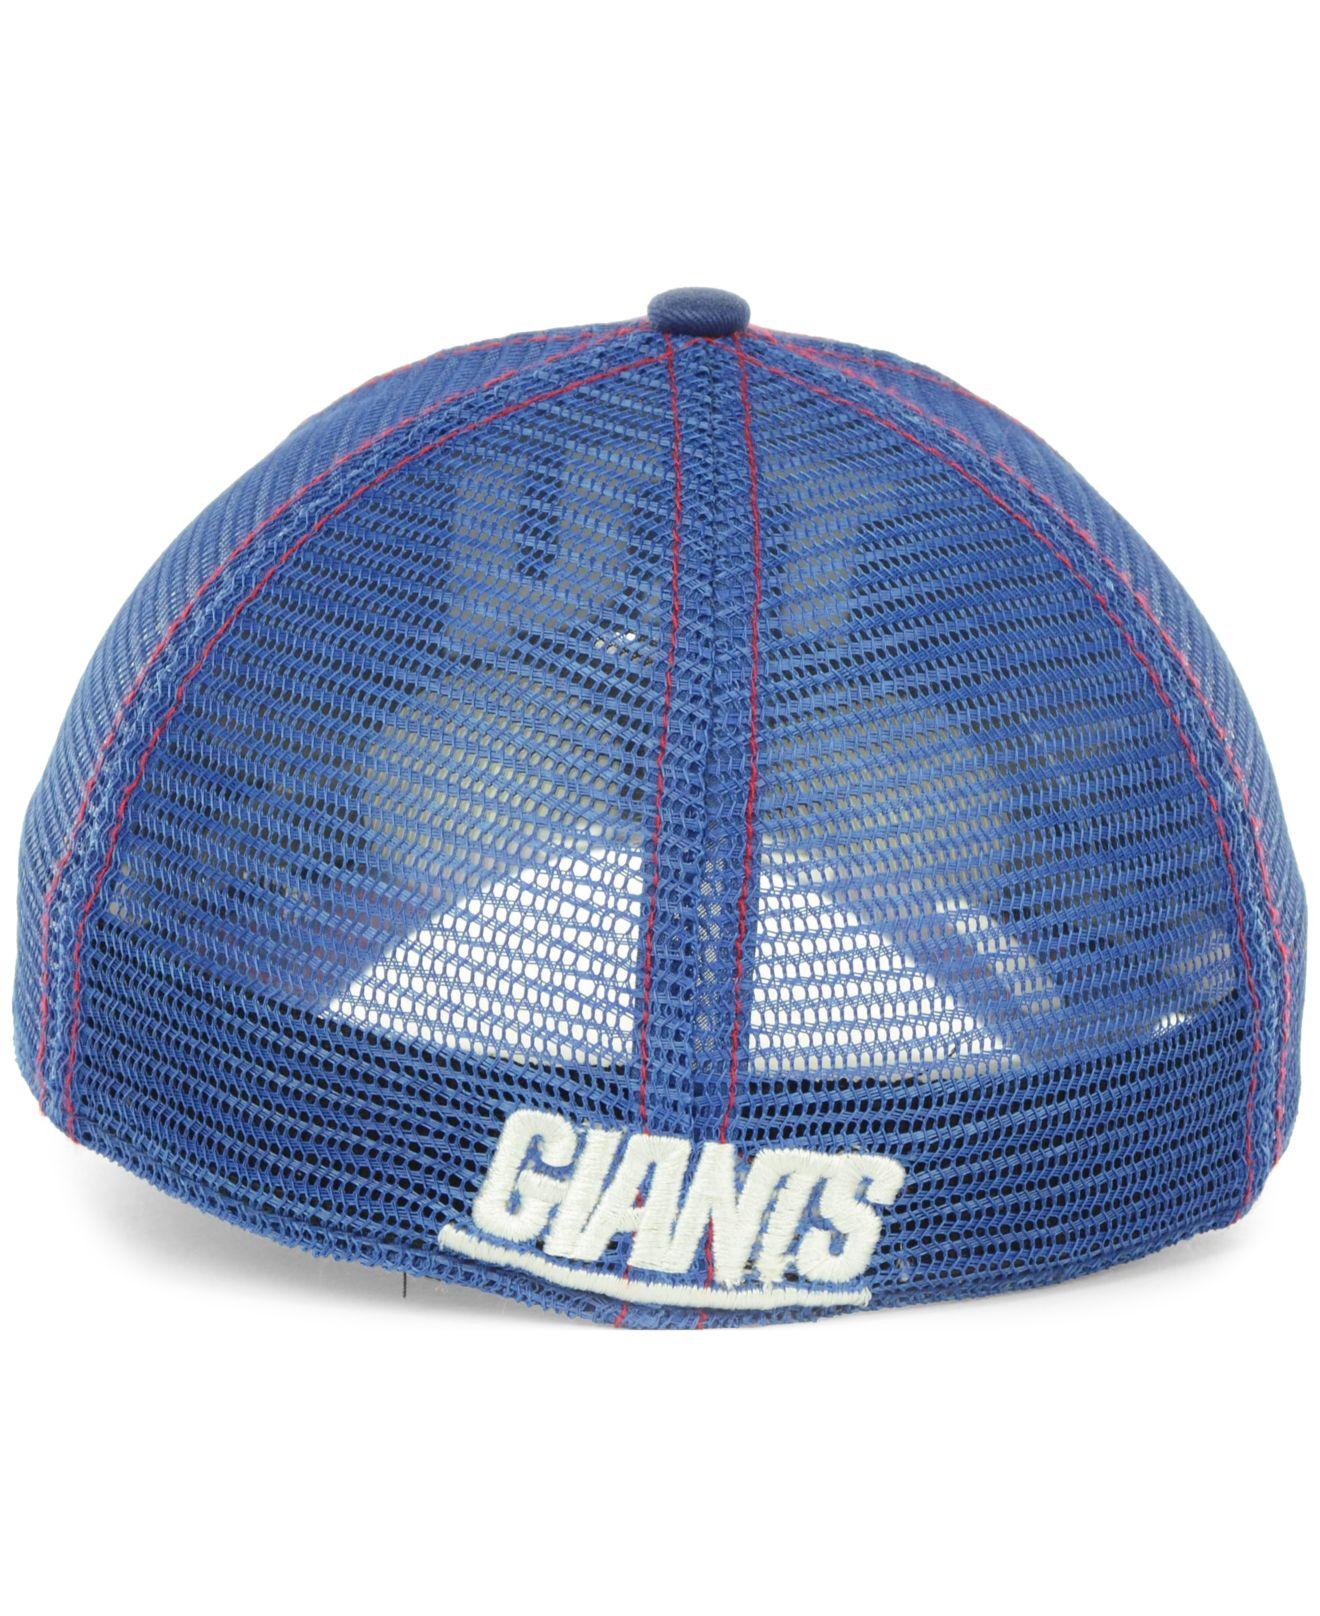 47 brand new york giants flexbone cap in blue for men lyst. Black Bedroom Furniture Sets. Home Design Ideas